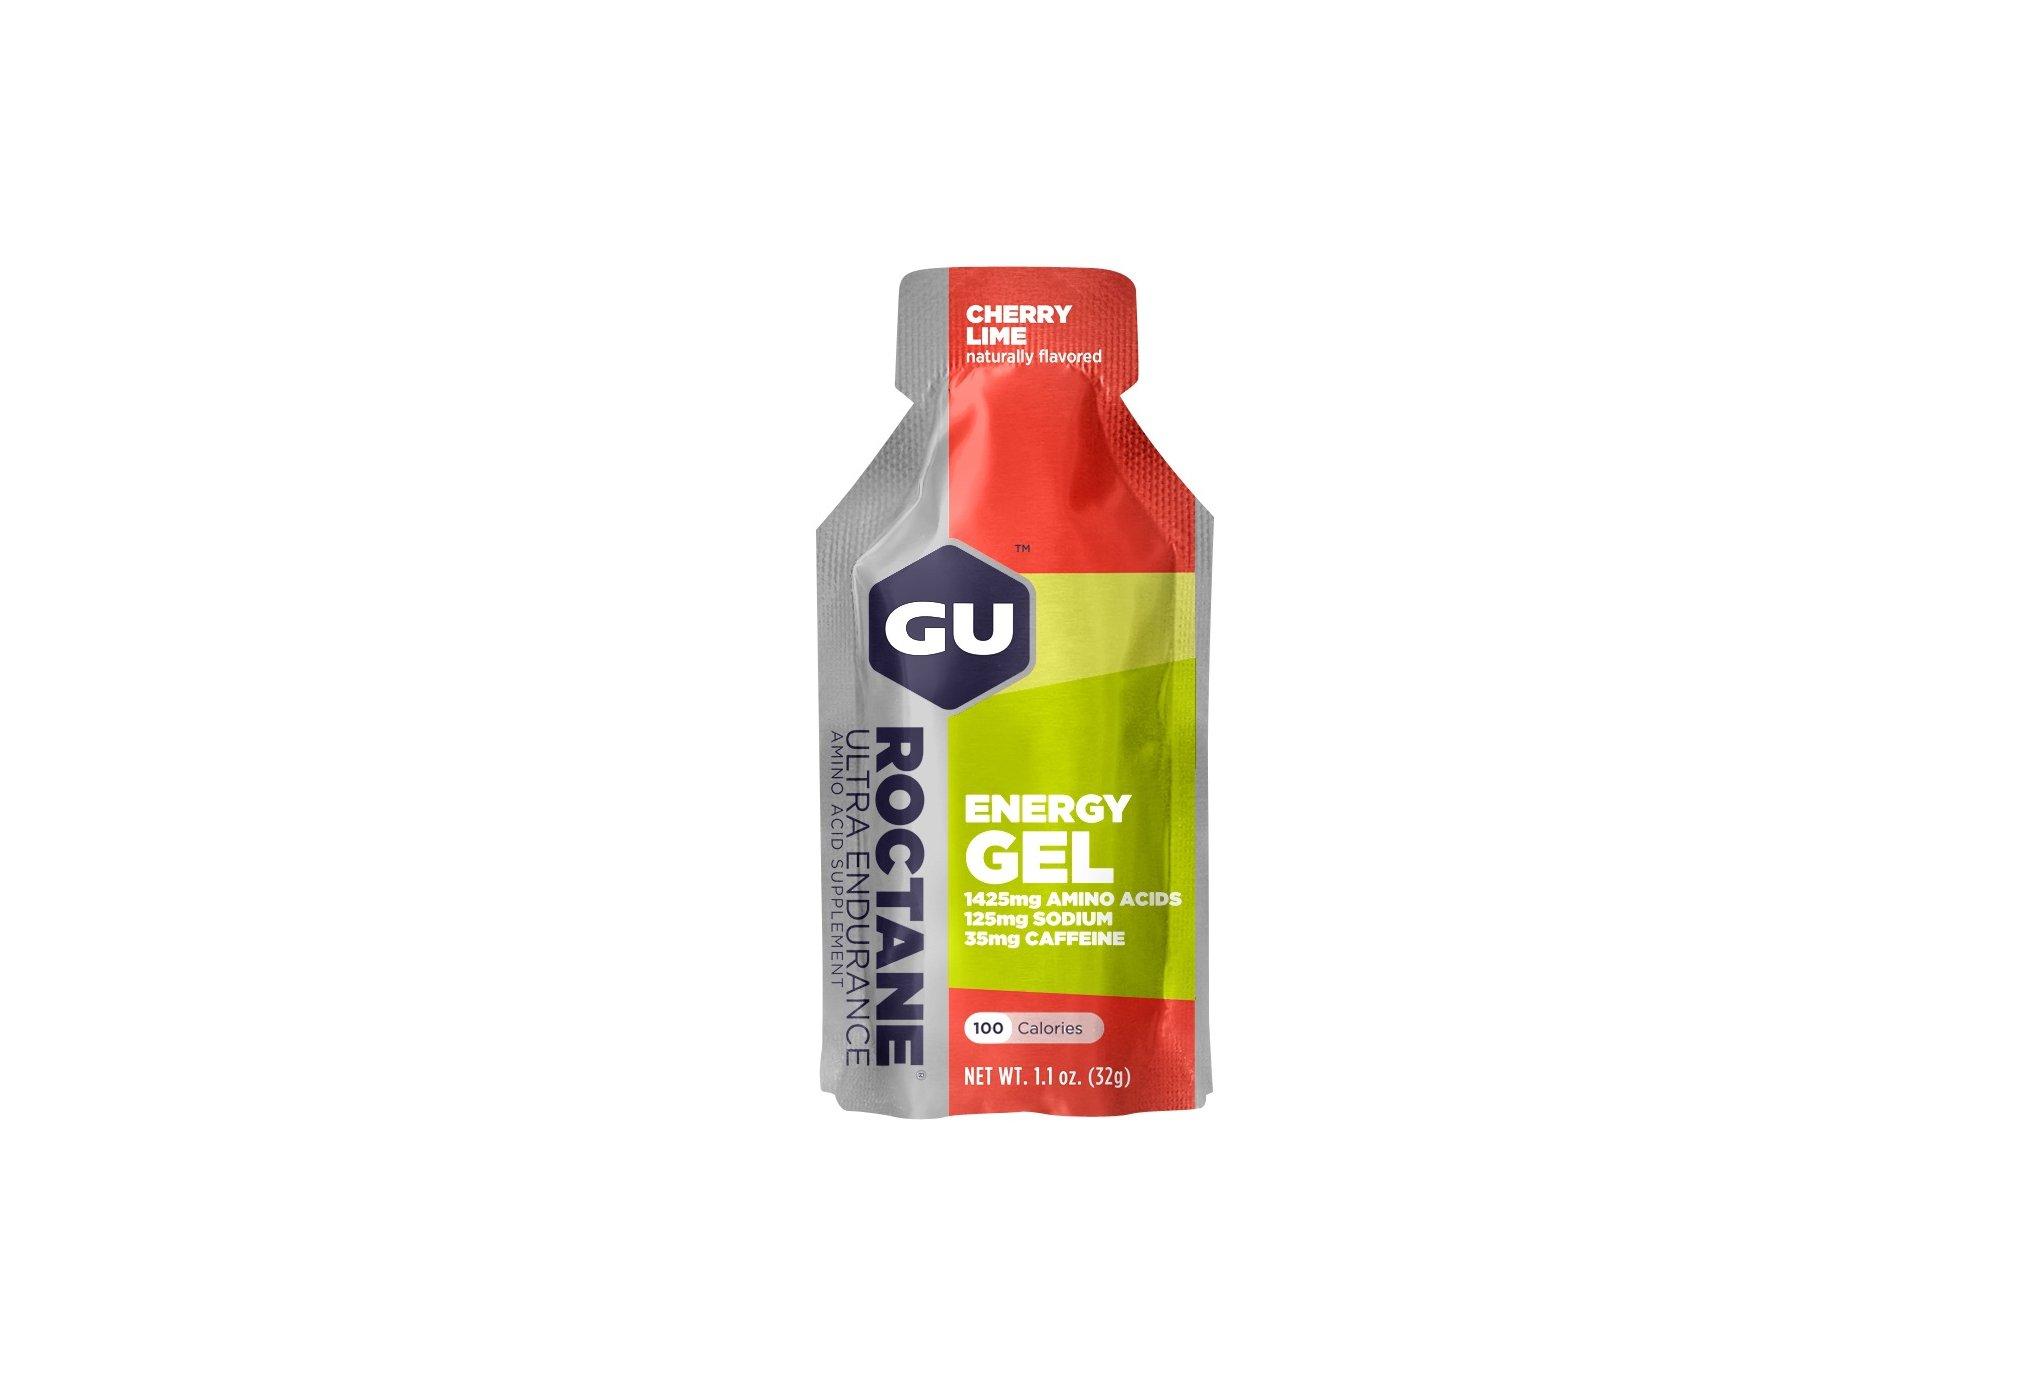 GU Gel Roctane Ultra Endurance - Cerise/Citron vert Diététique Gels